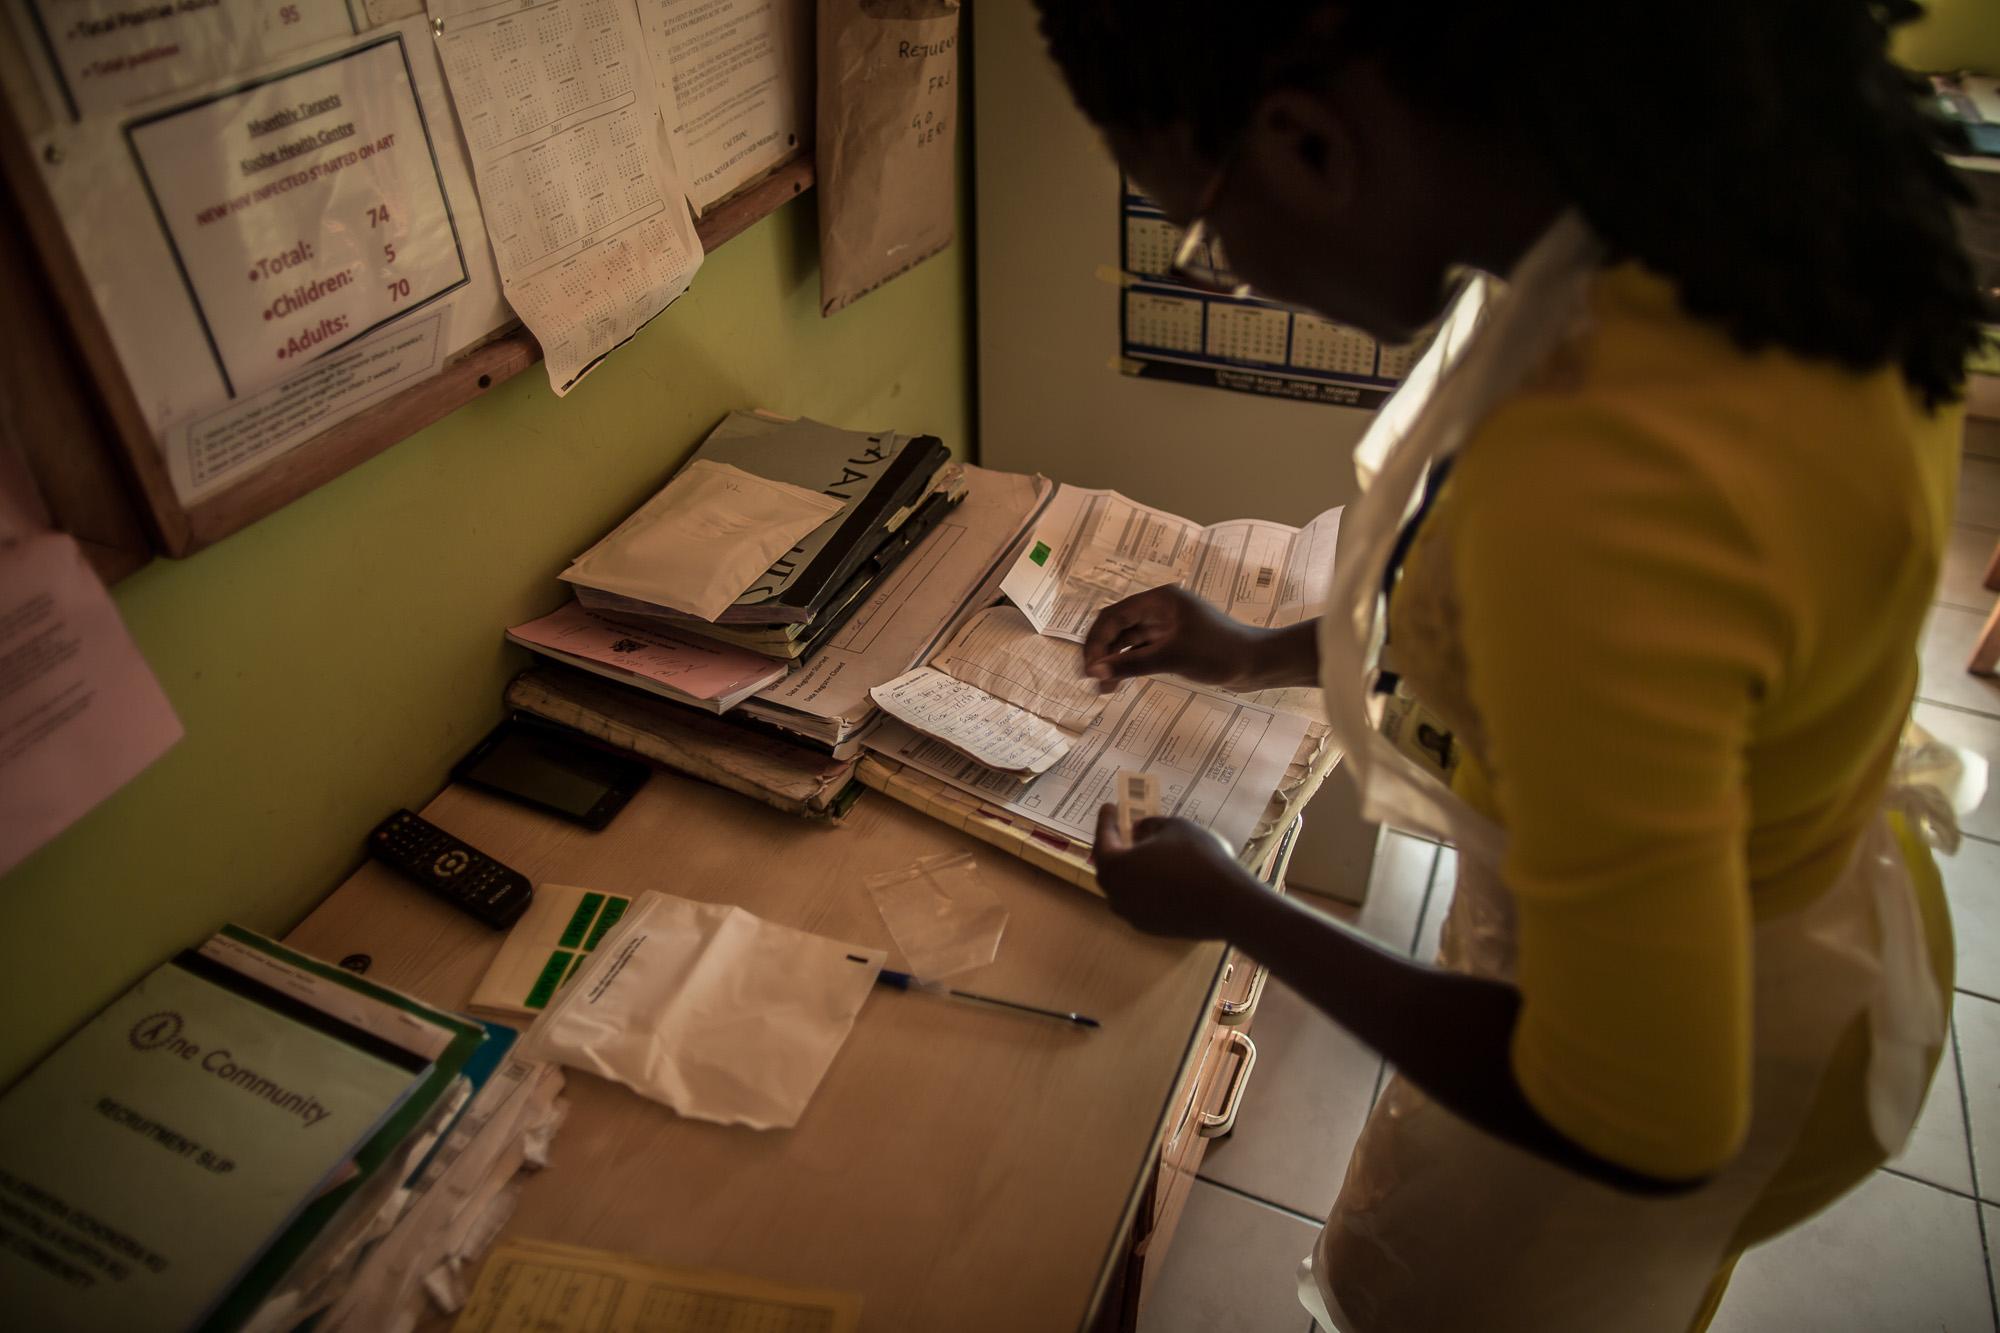 Linda Mvula updating patients records